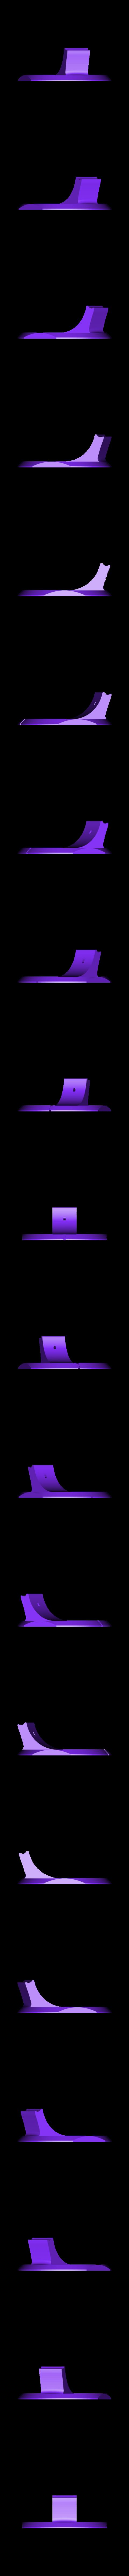 Rotating_Base.stl Download STL file Adjustable lamp - with vertebrae  • 3D printable object, Ciokobango